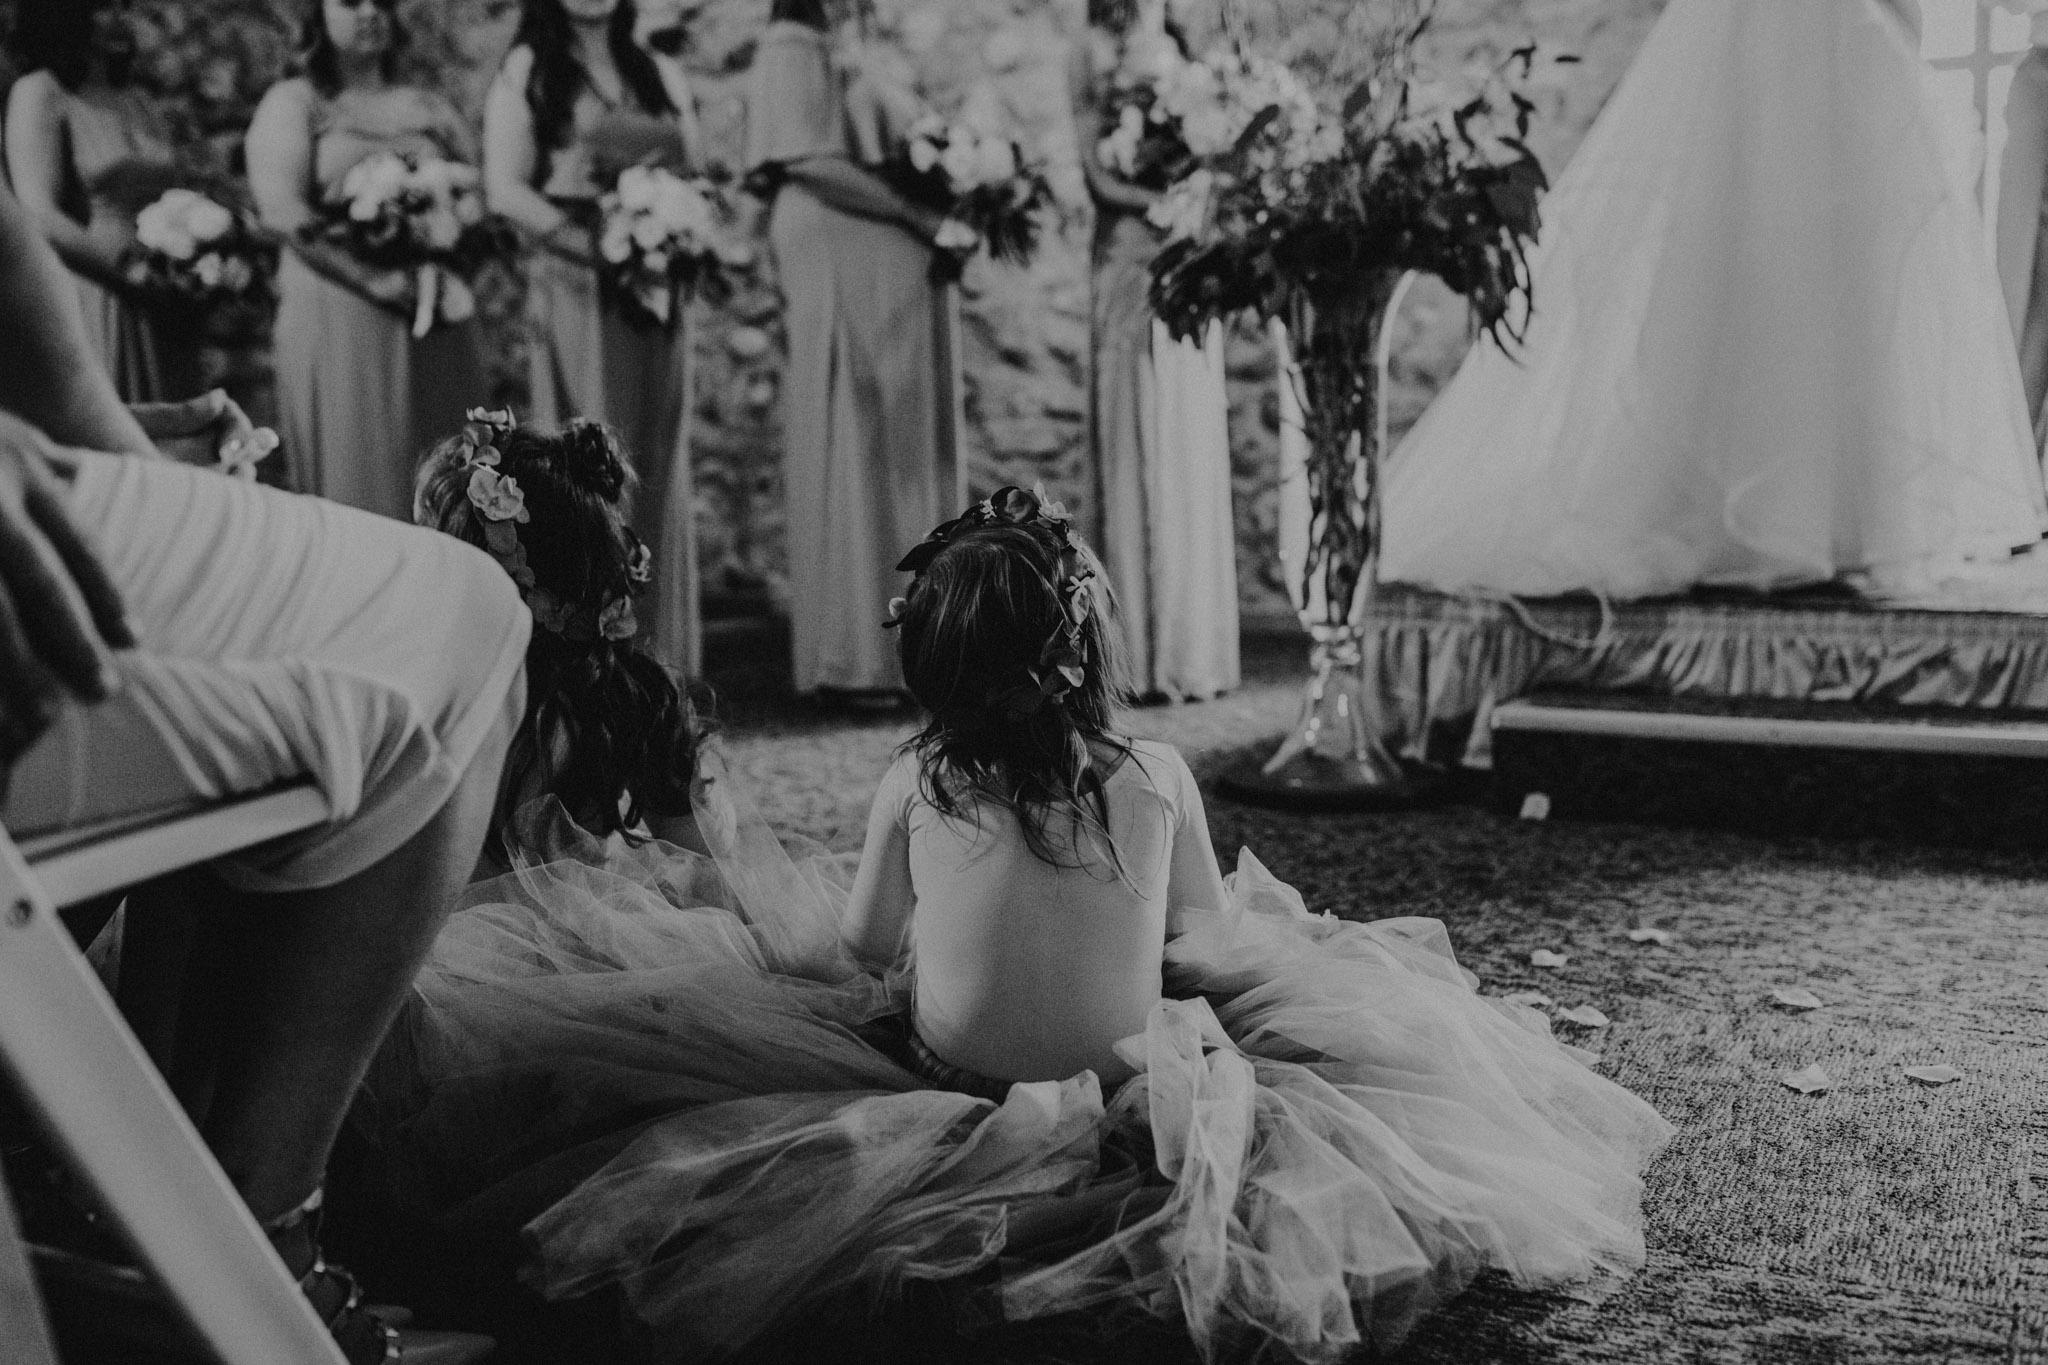 Castle-Farms-Lake-Charlevoix-Wedding-60.jpg